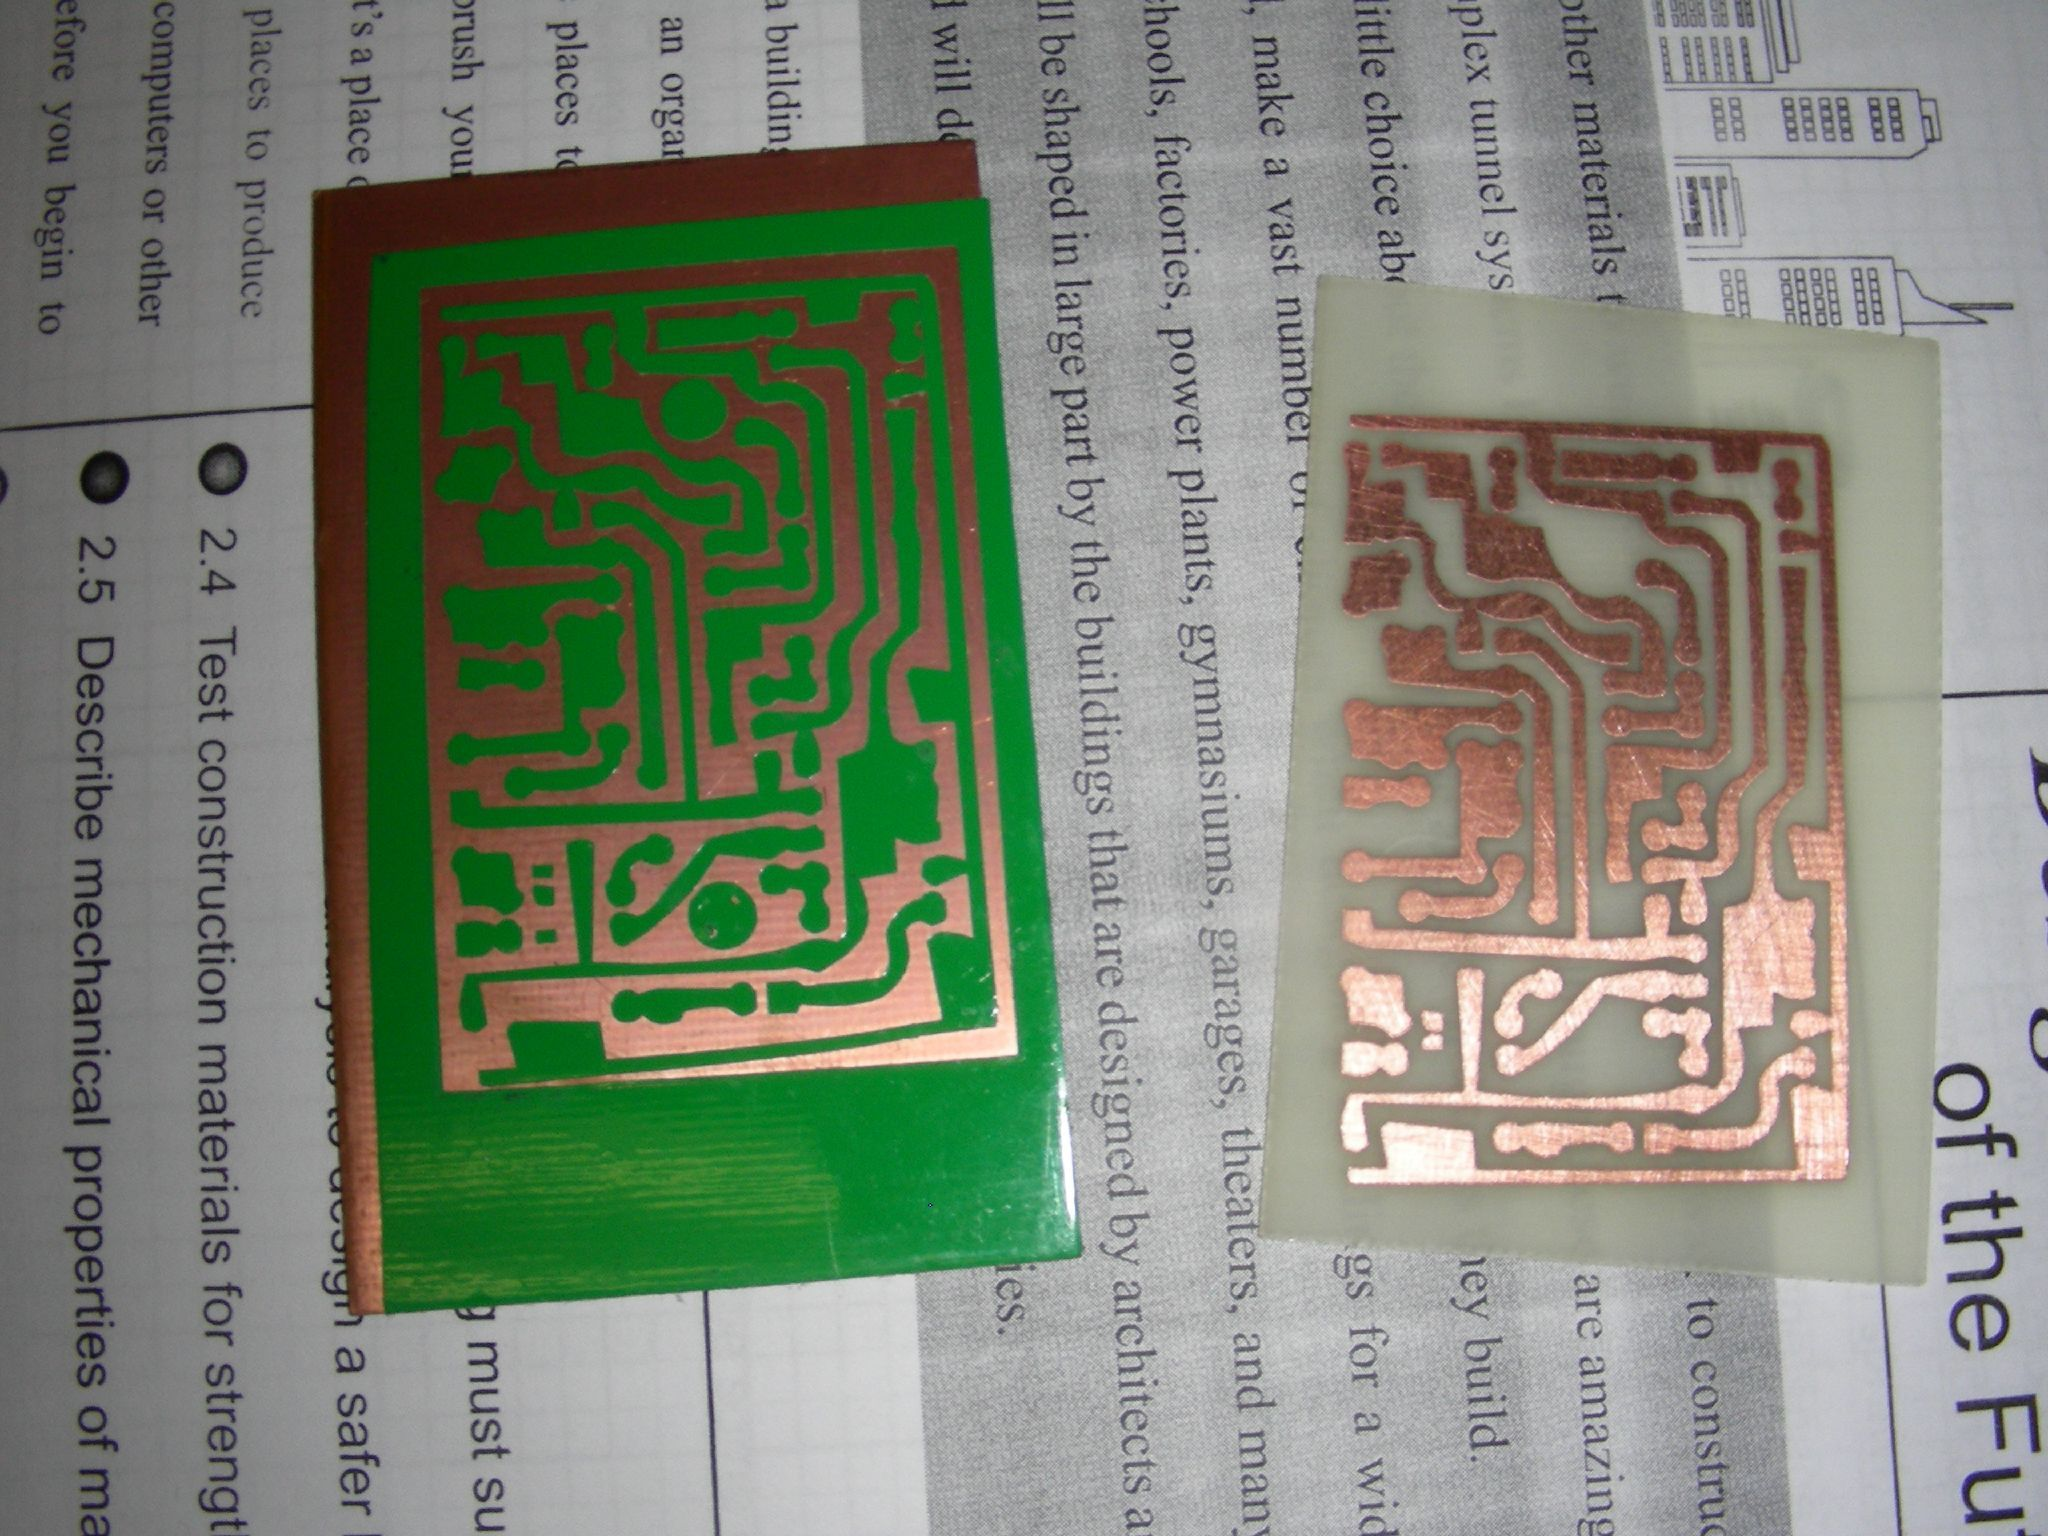 Vinyl Cut PCB Resist